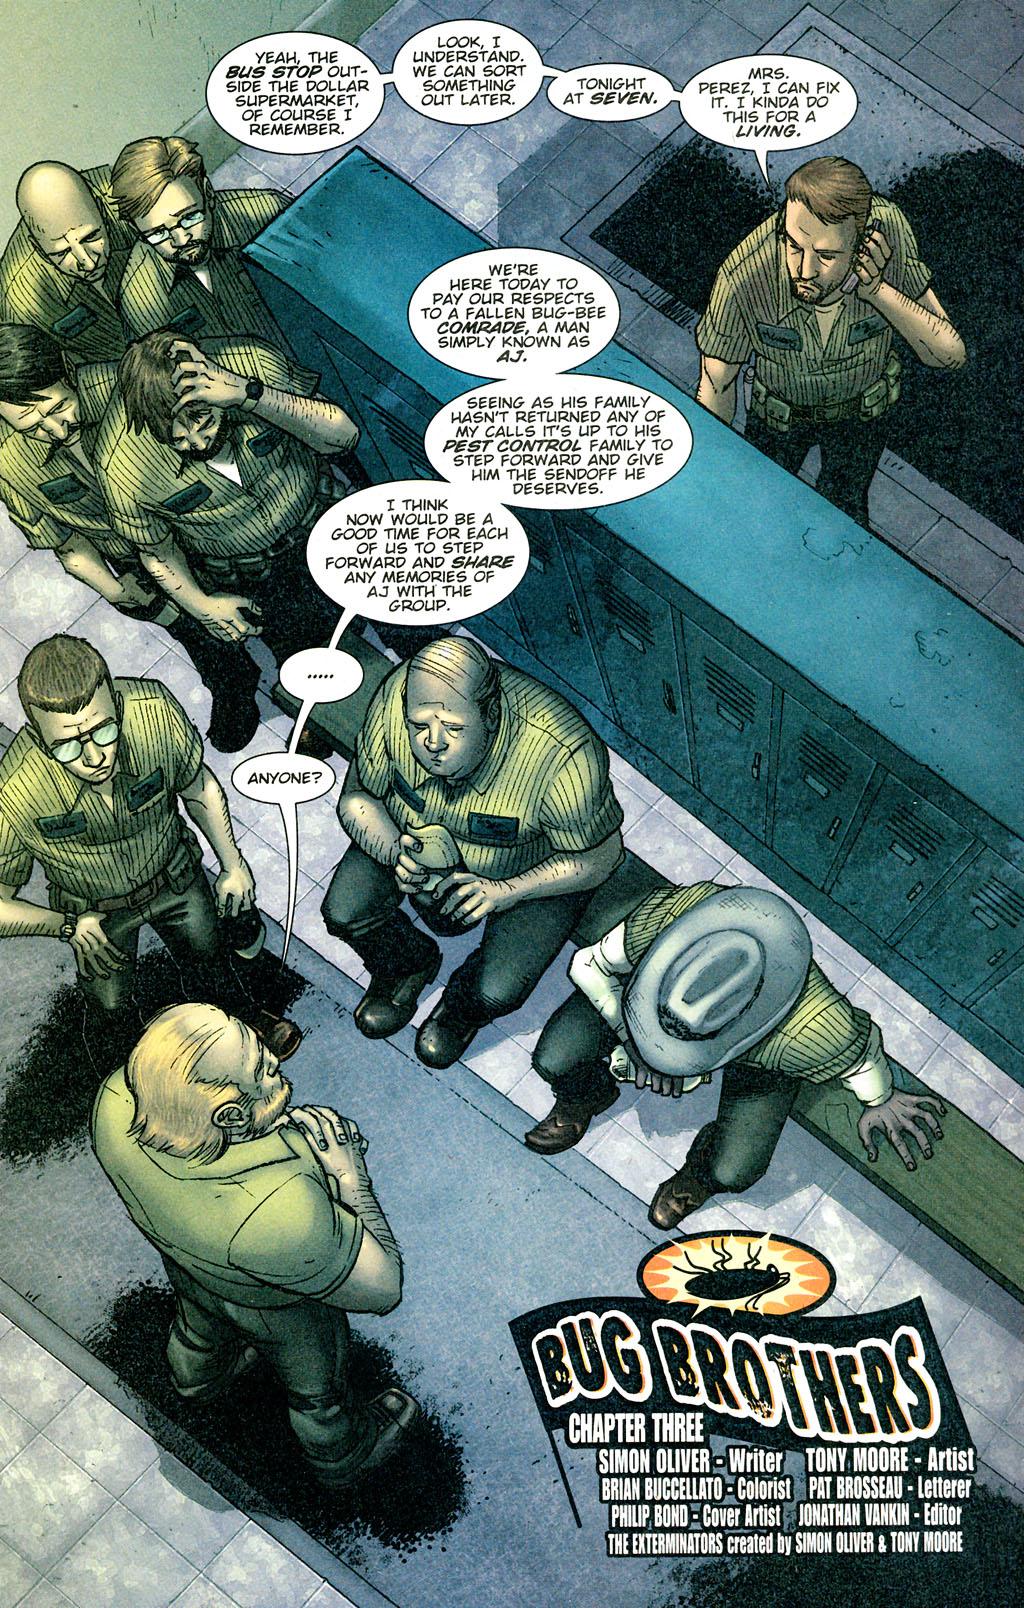 Read online The Exterminators comic -  Issue #3 - 4